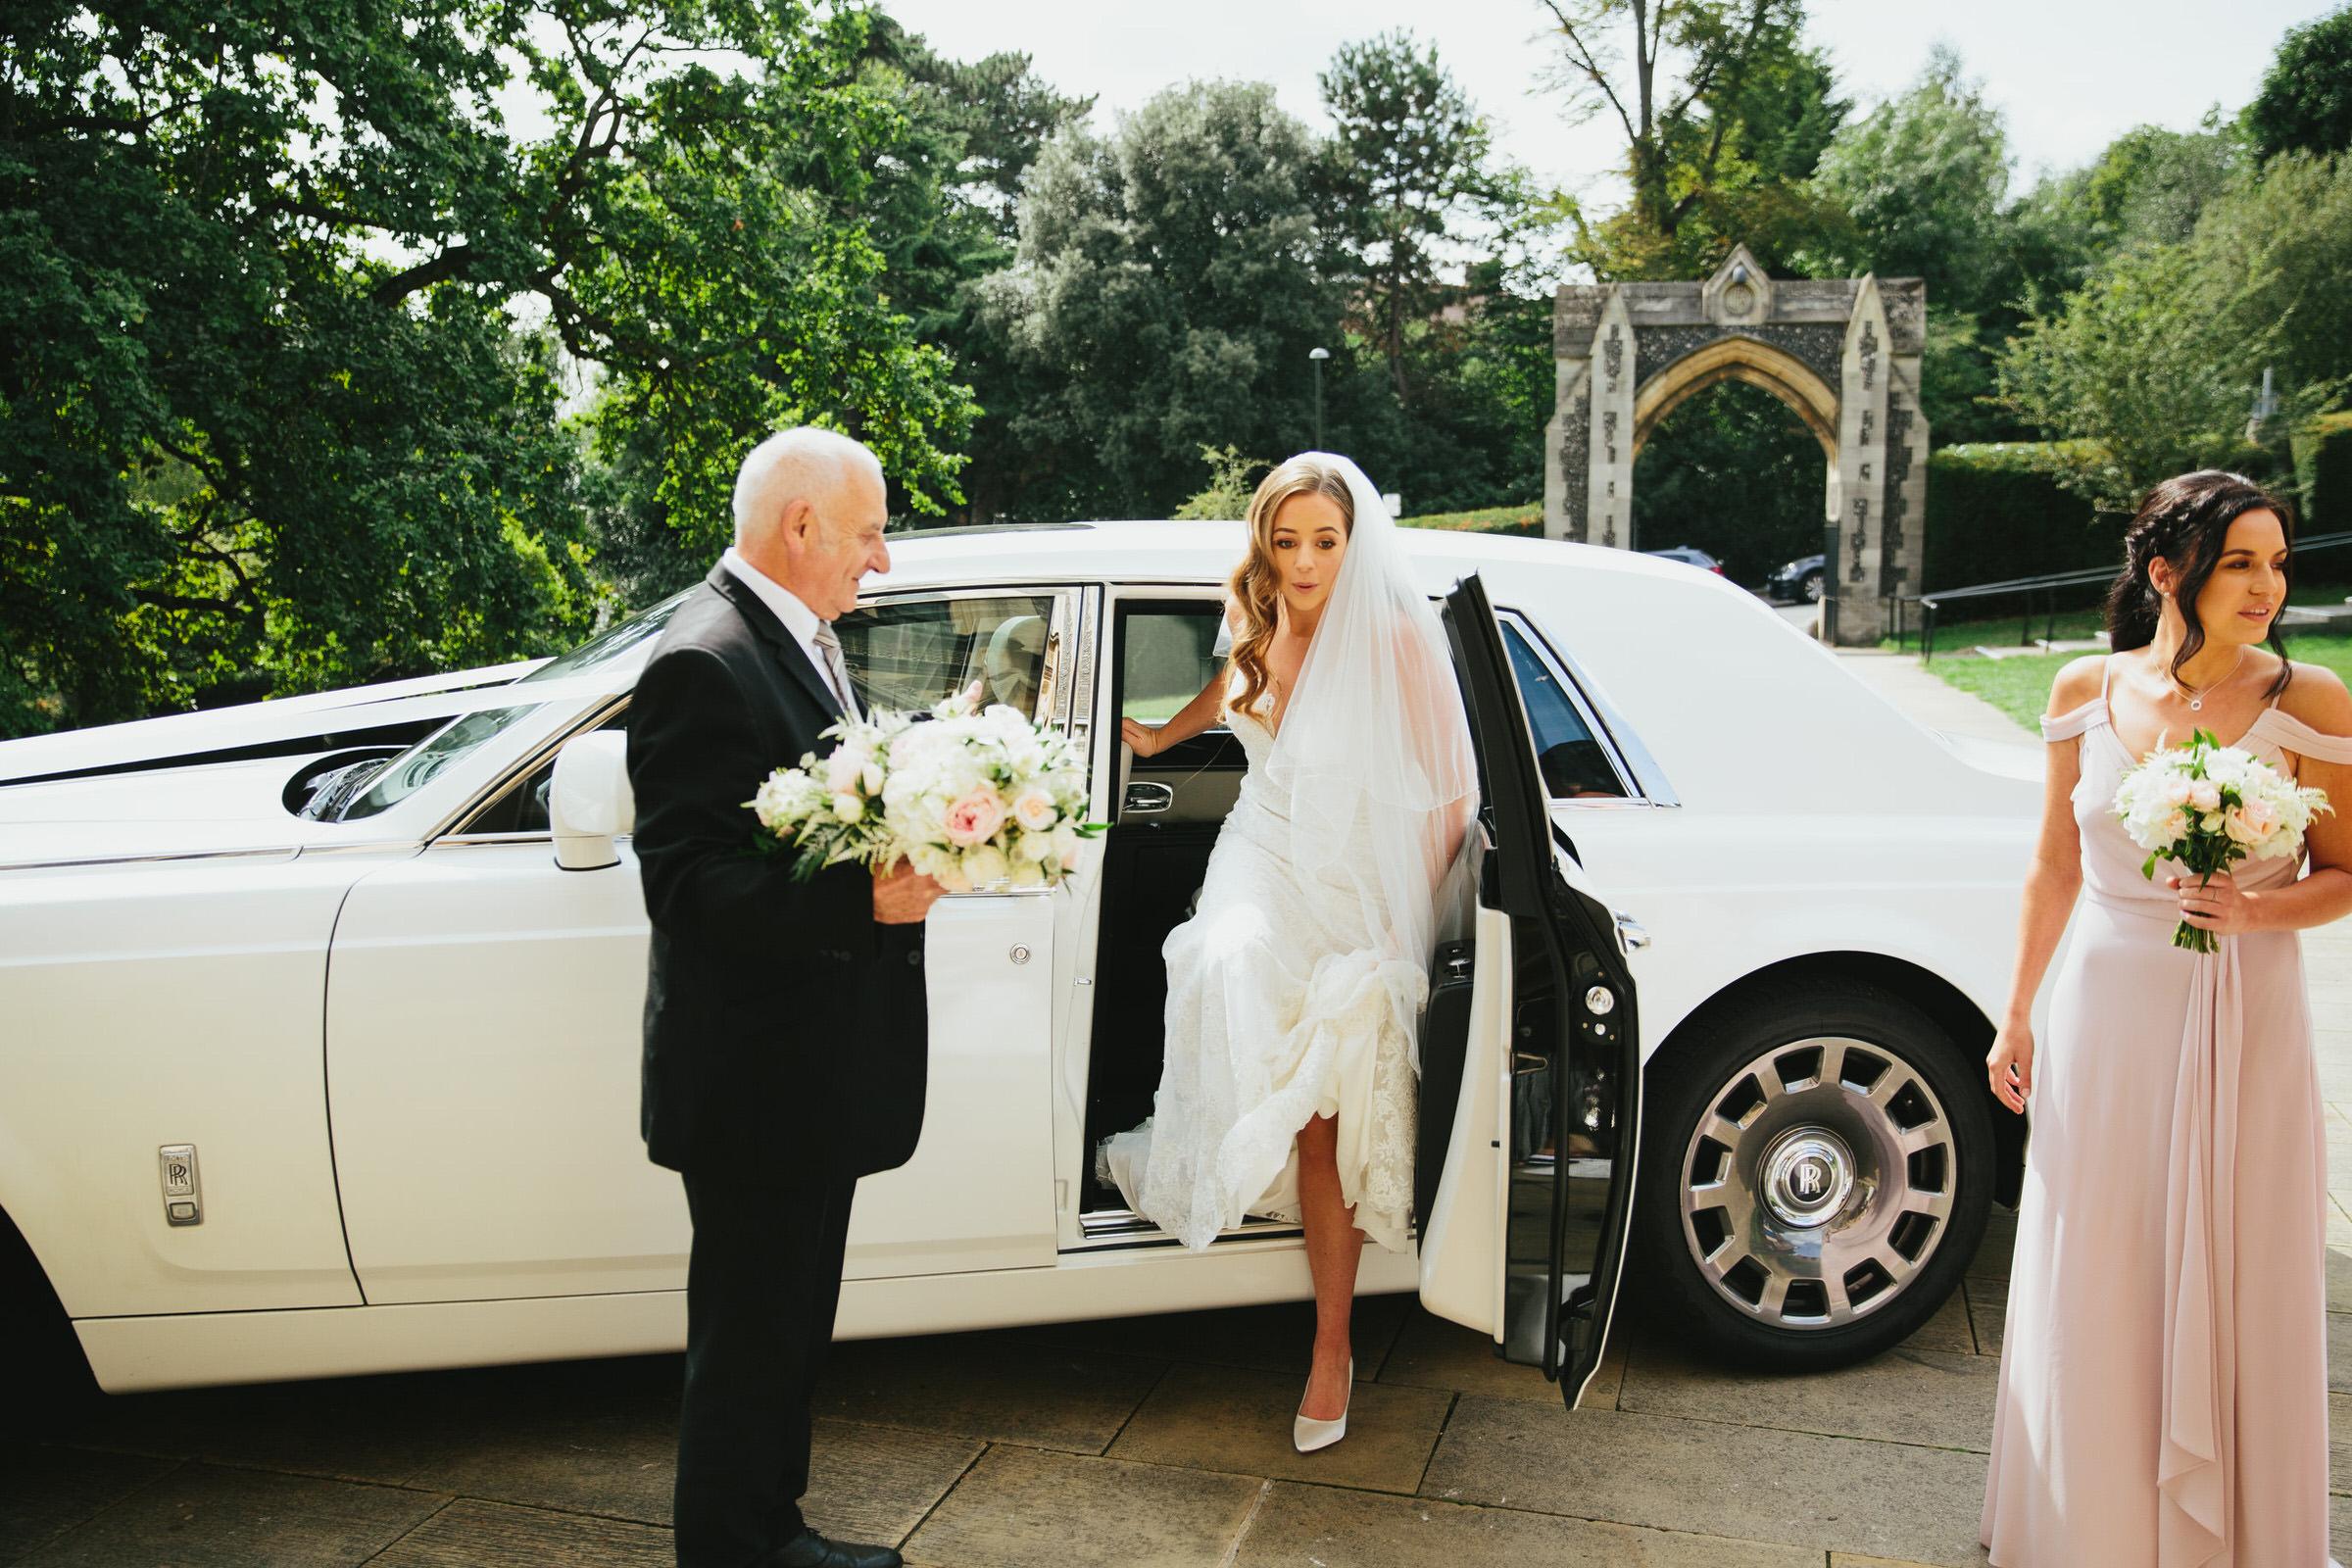 Syon Park wedding photographer - Pip & Luke